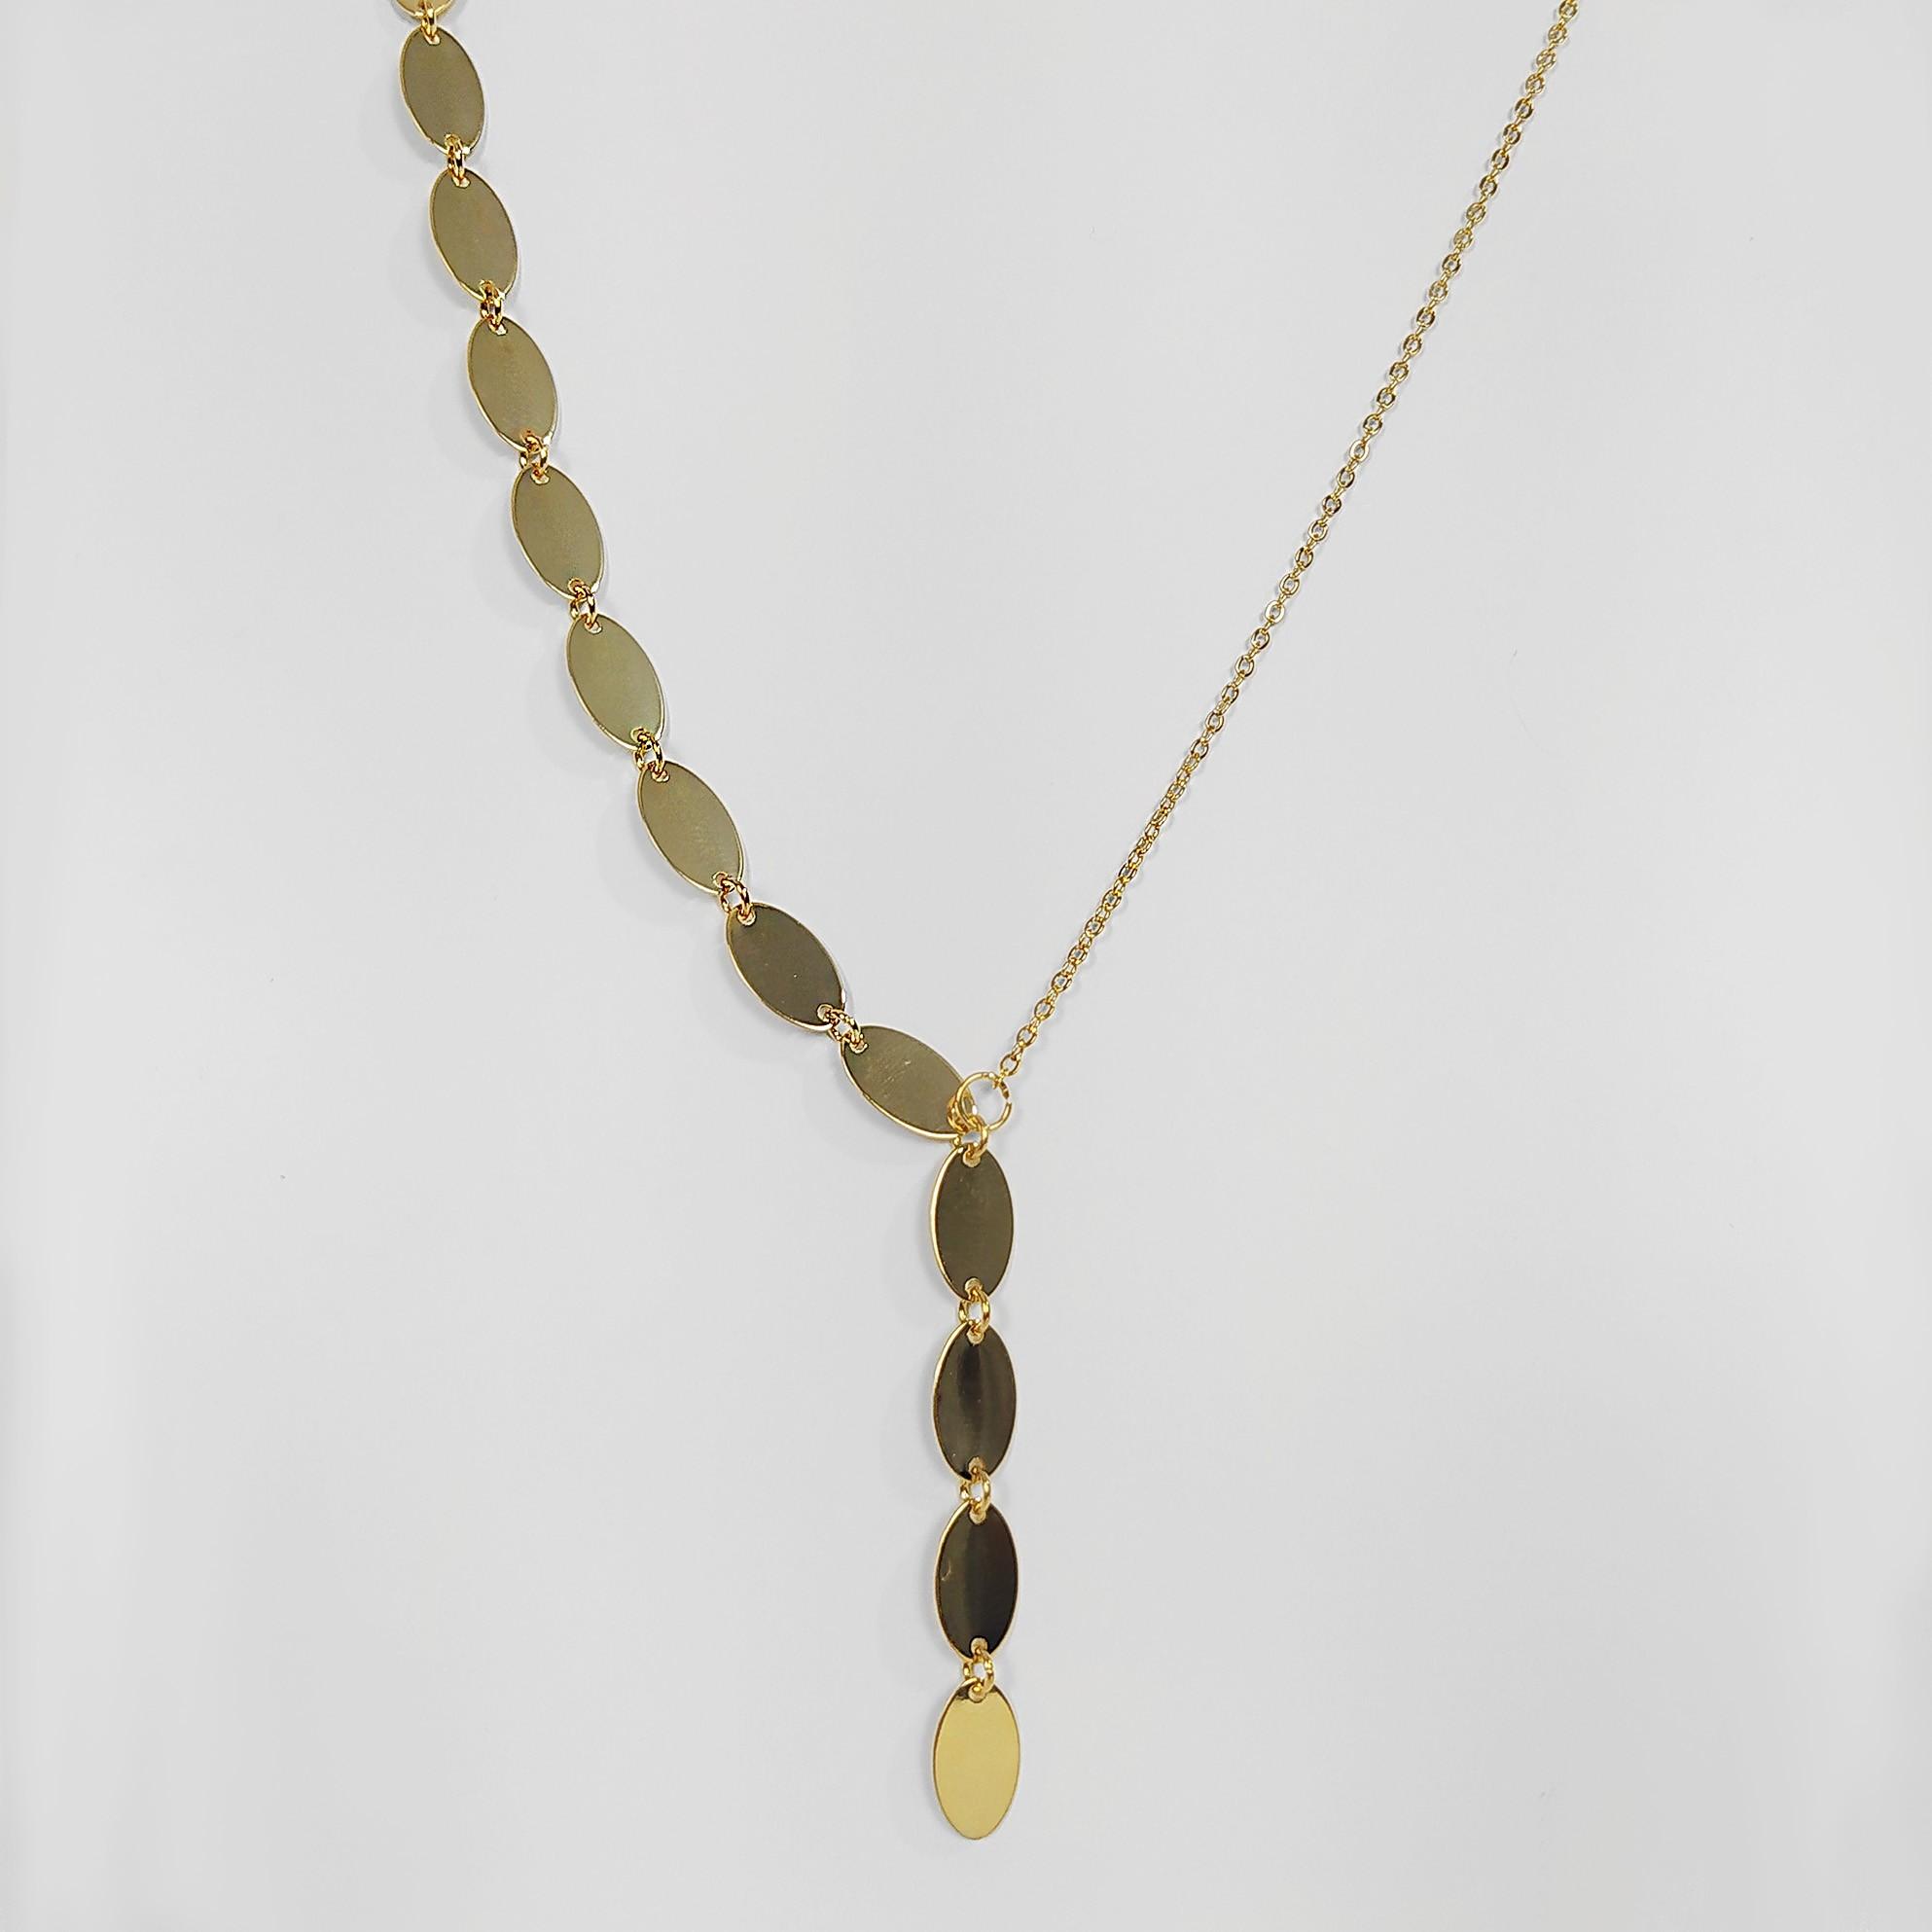 Colar Gravatinha Unilateral Oval Folheado a Ouro 18k  - Lunozê Joias